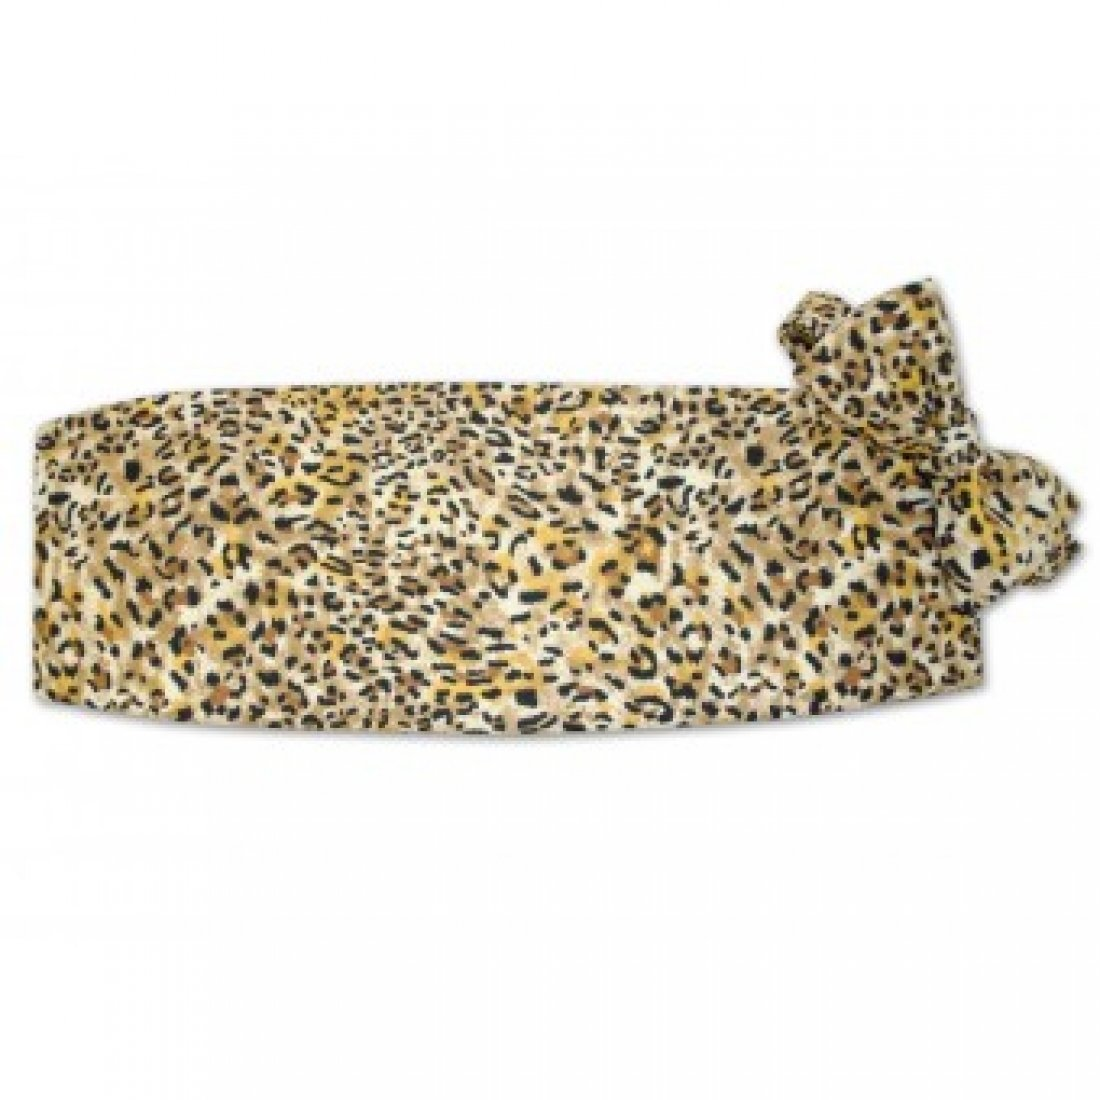 Leopard Tuxedo Cummerbund and Bow Tie by David's Formal Wear